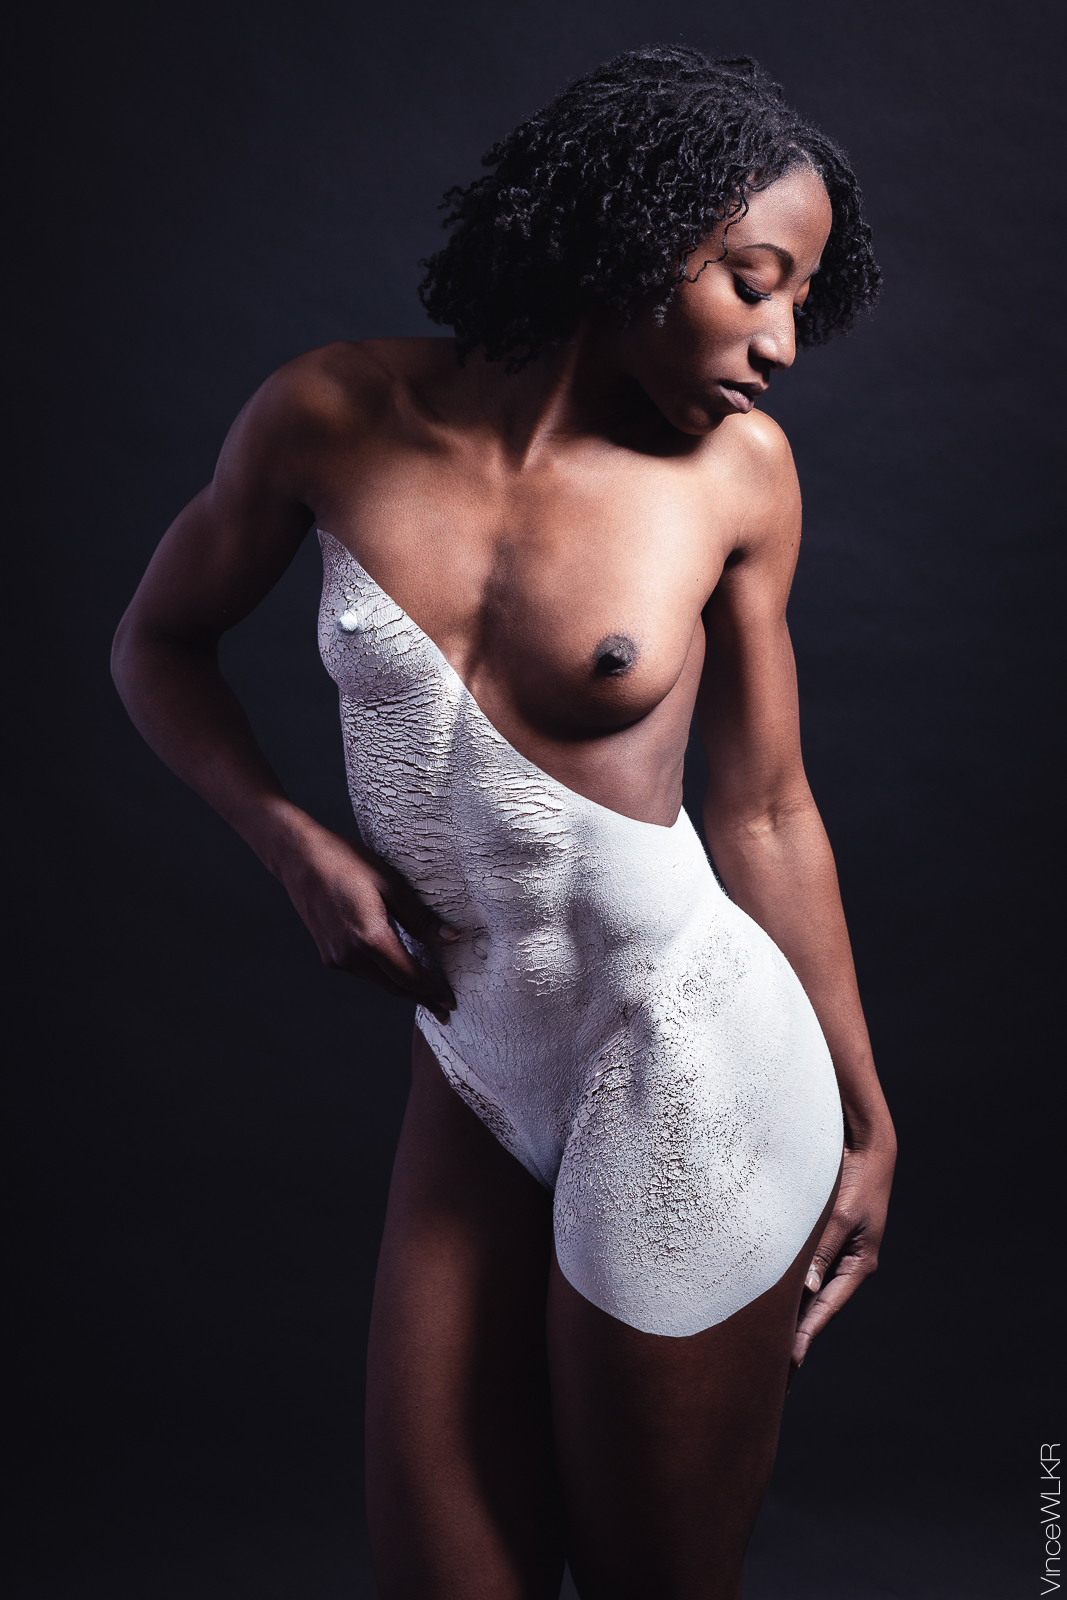 bodypainting fond noir photographe vincewlkr